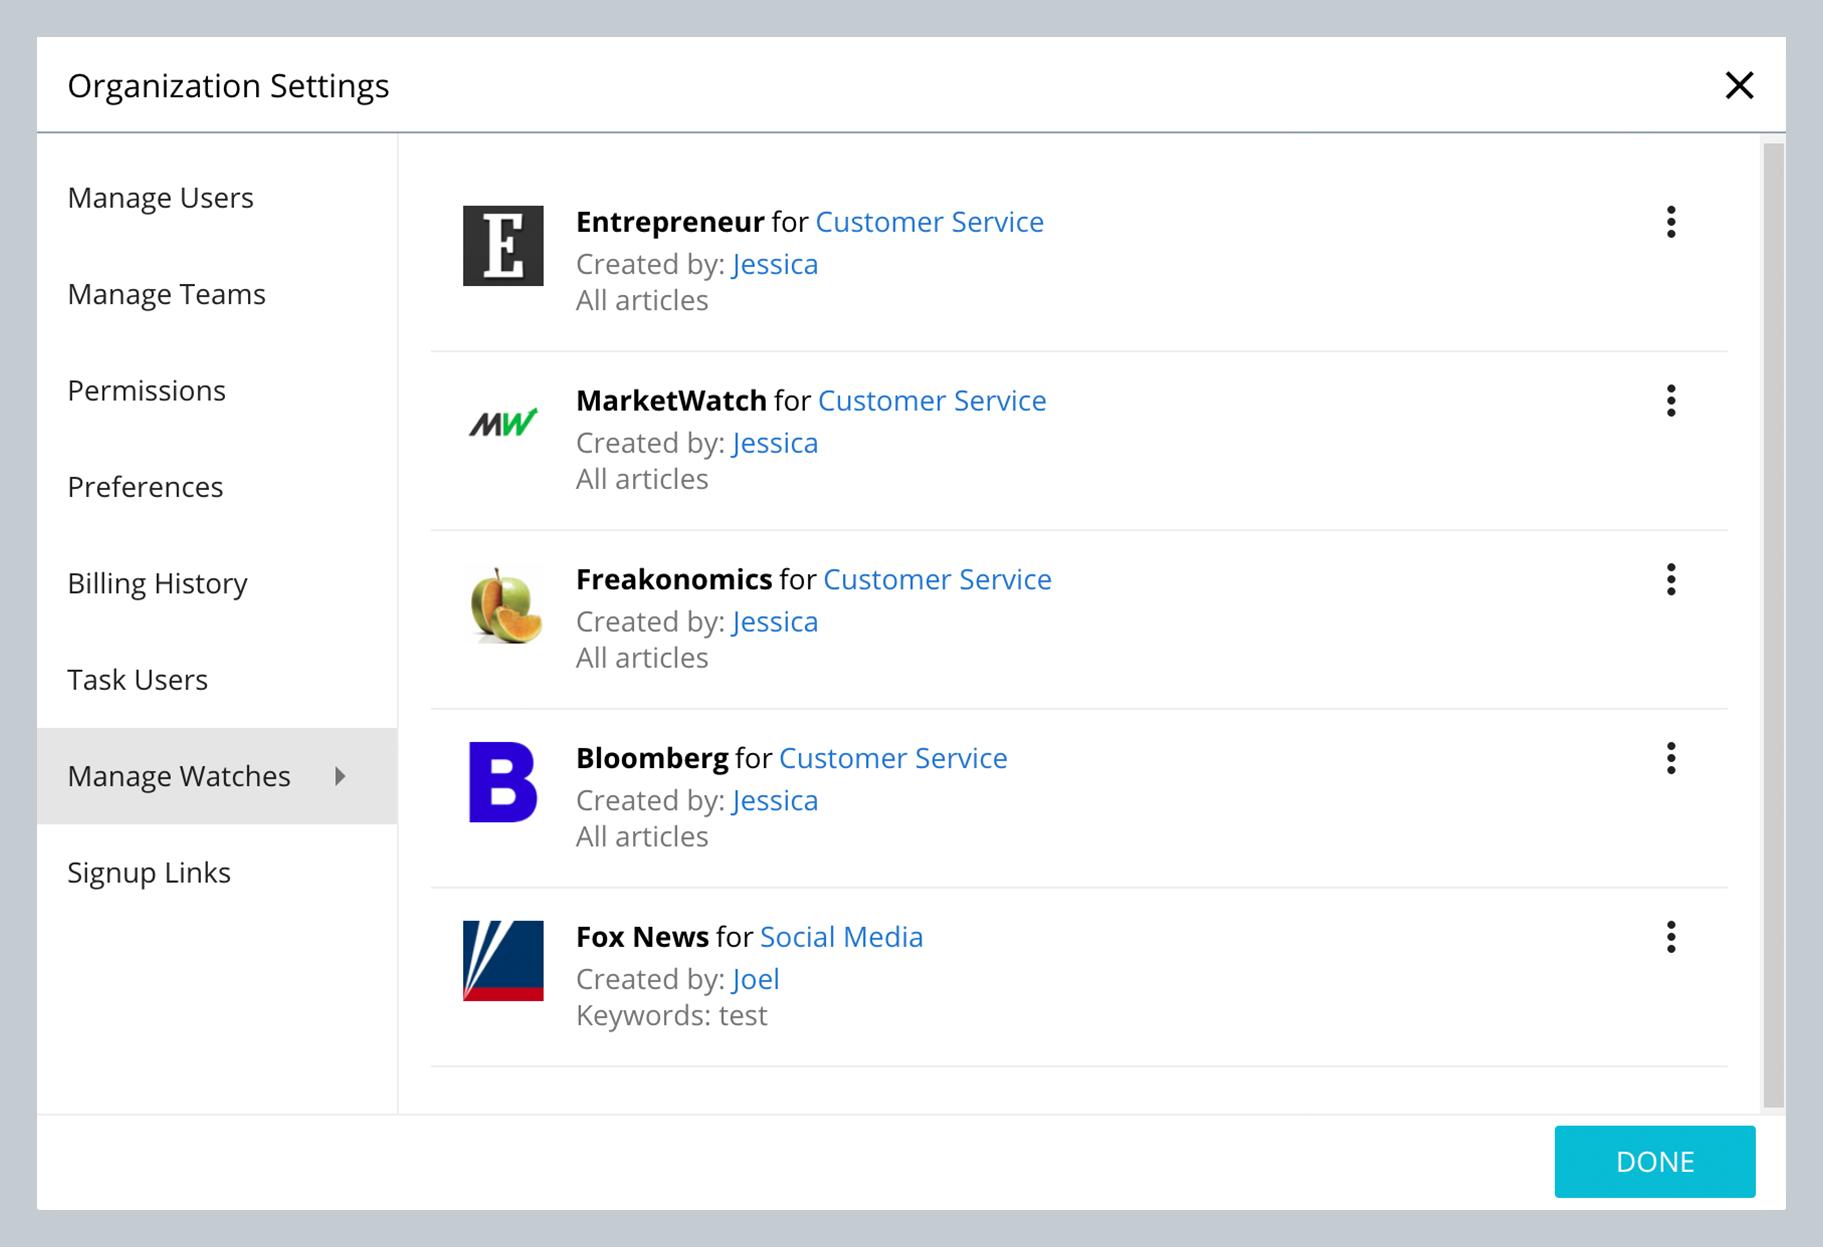 User Guide: Organization Settings